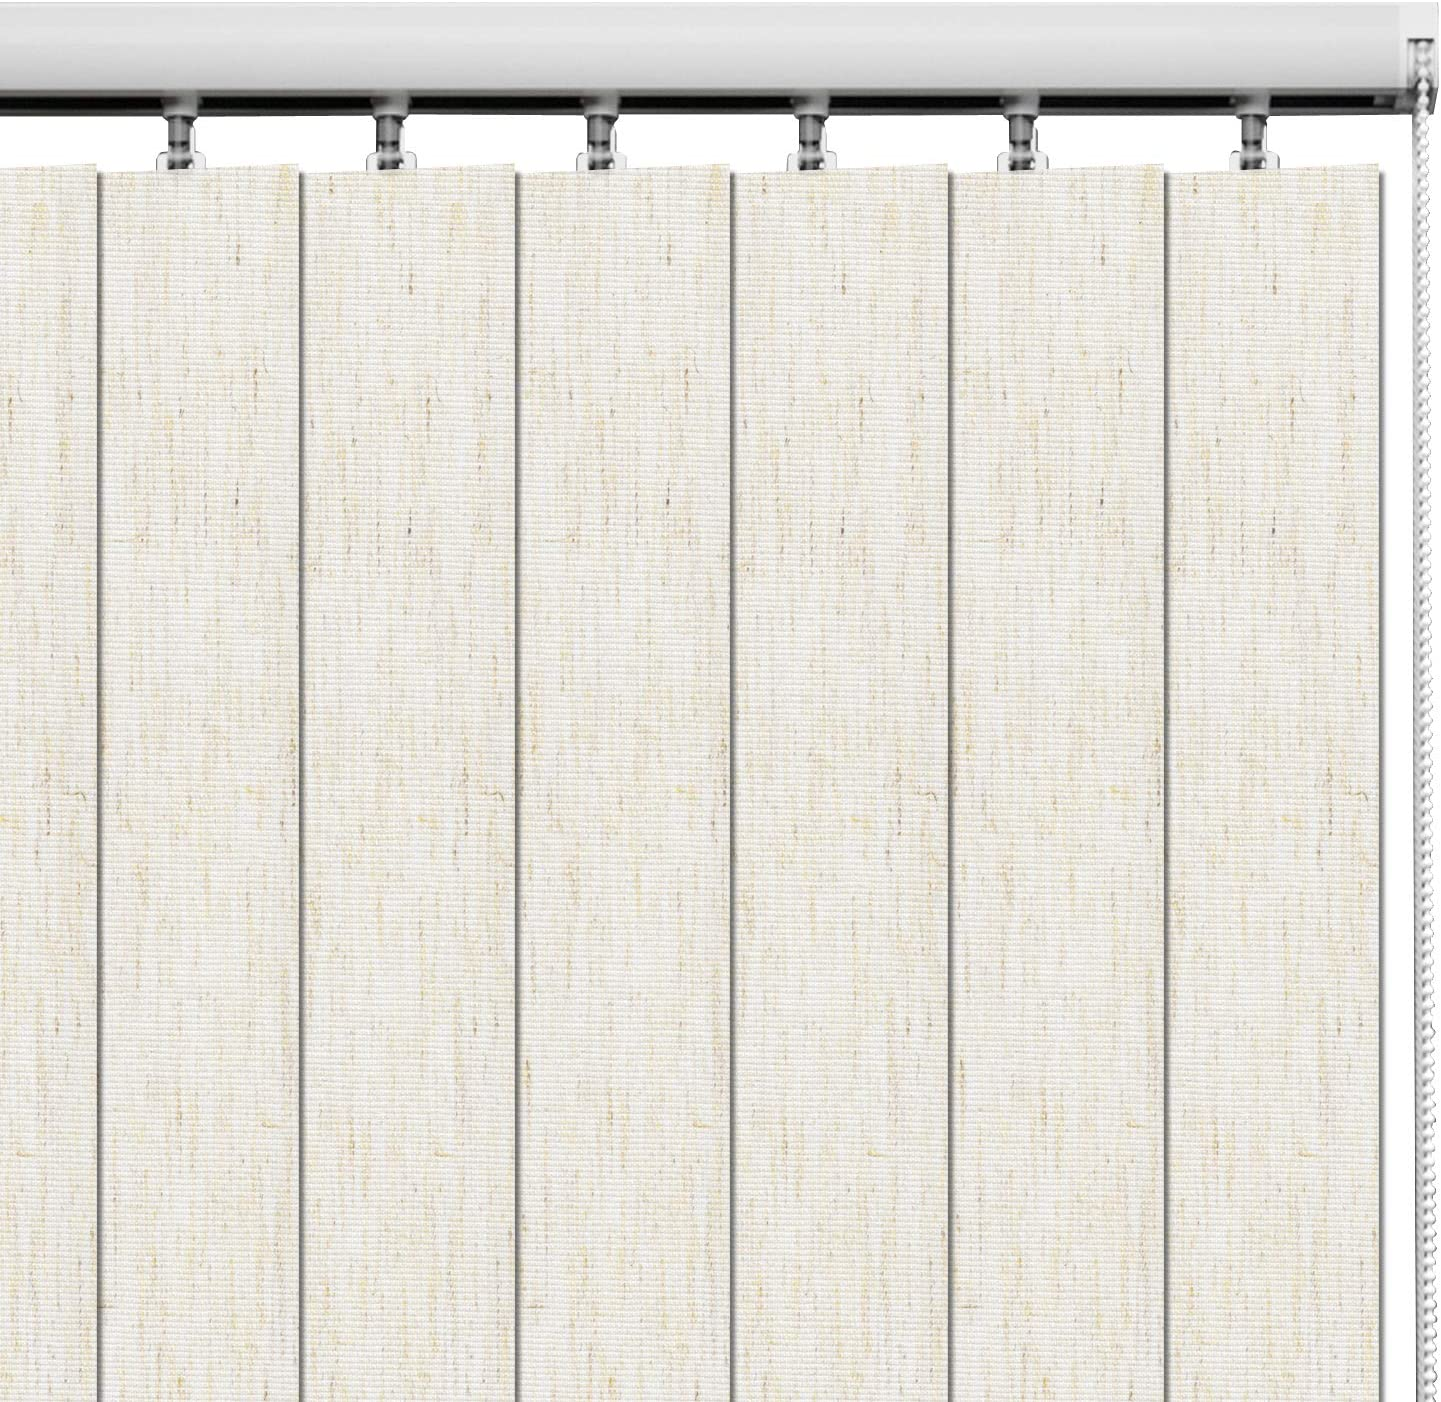 HousCa Blackout Vertical Blinds Window Beige Max Cheap bargain 43% OFF Linen Custo Shades